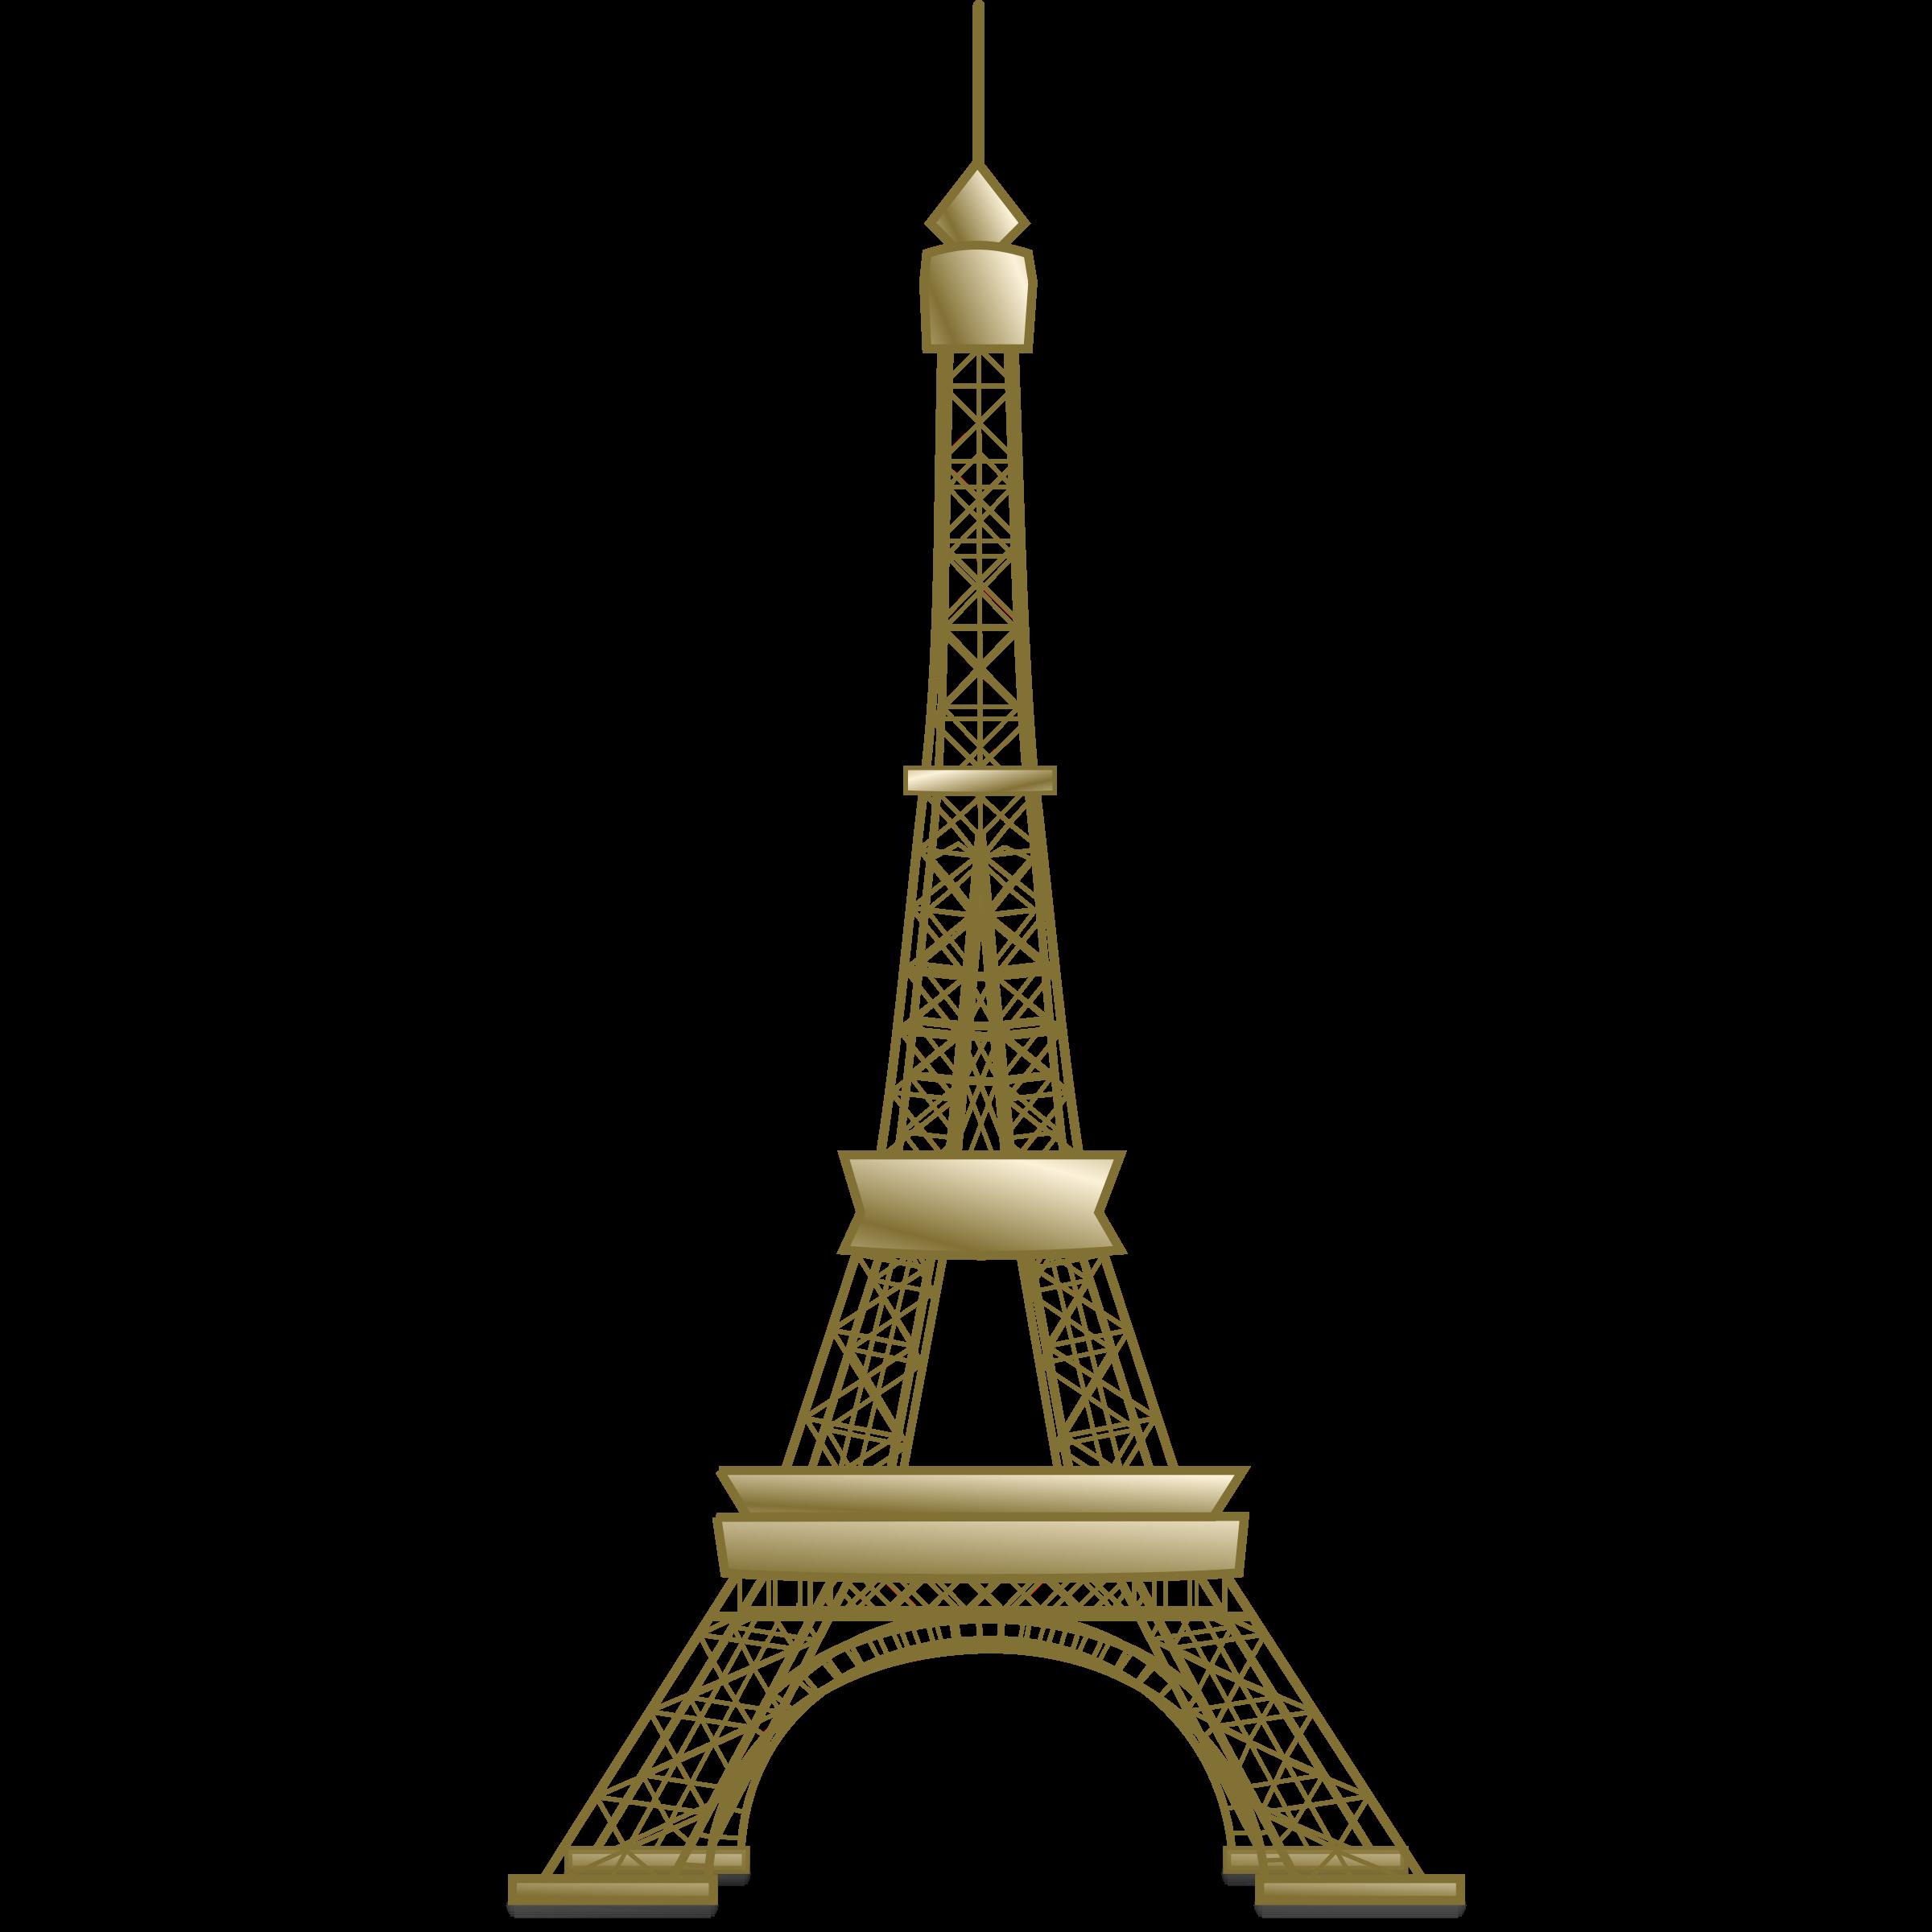 Eiffel tower clipart image clip art the eiffel.